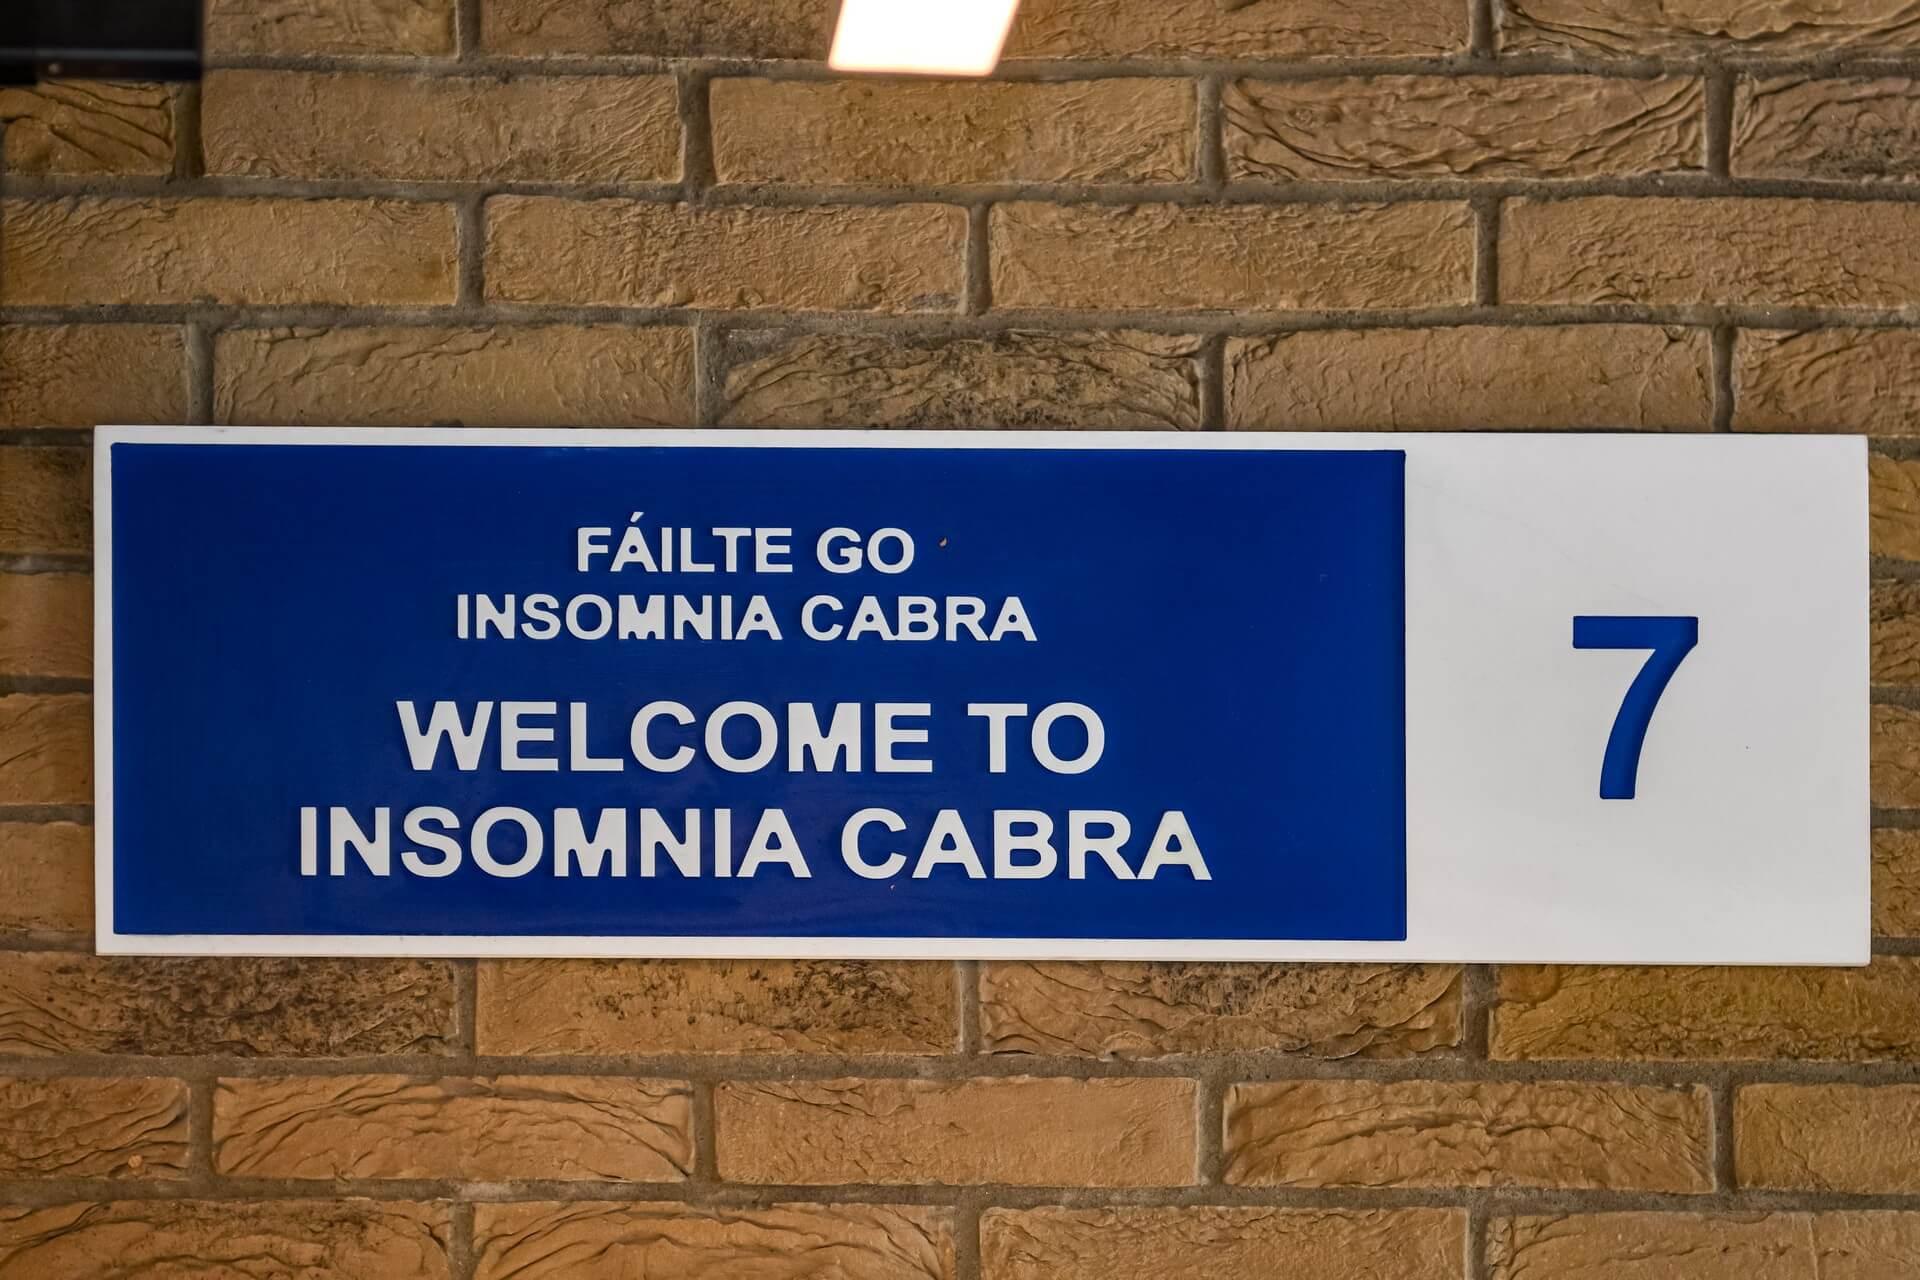 Insomnia Cabra